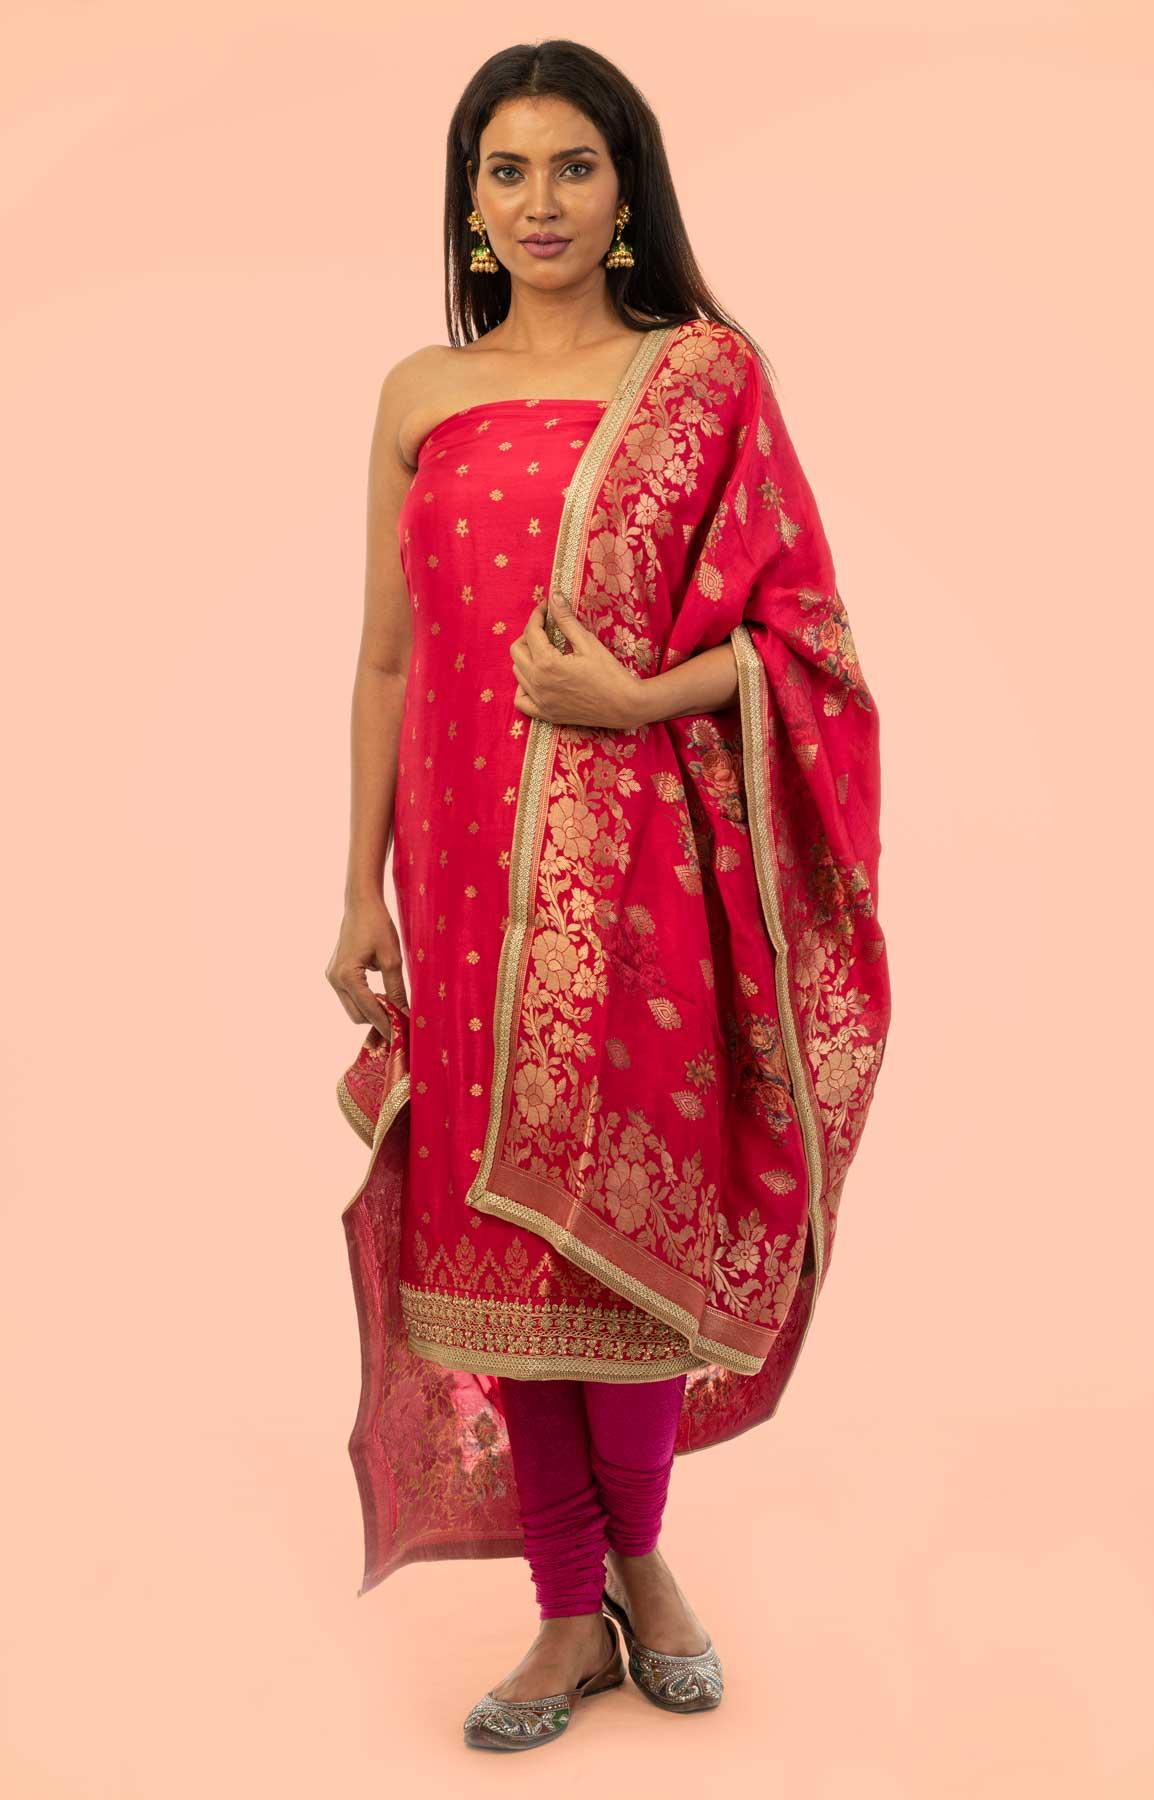 Rani Pink Banarasi Opara Silk Suit Fabric With Zari Work – Viraaya By Ushnakmals – Viraaya By Ushnakmals